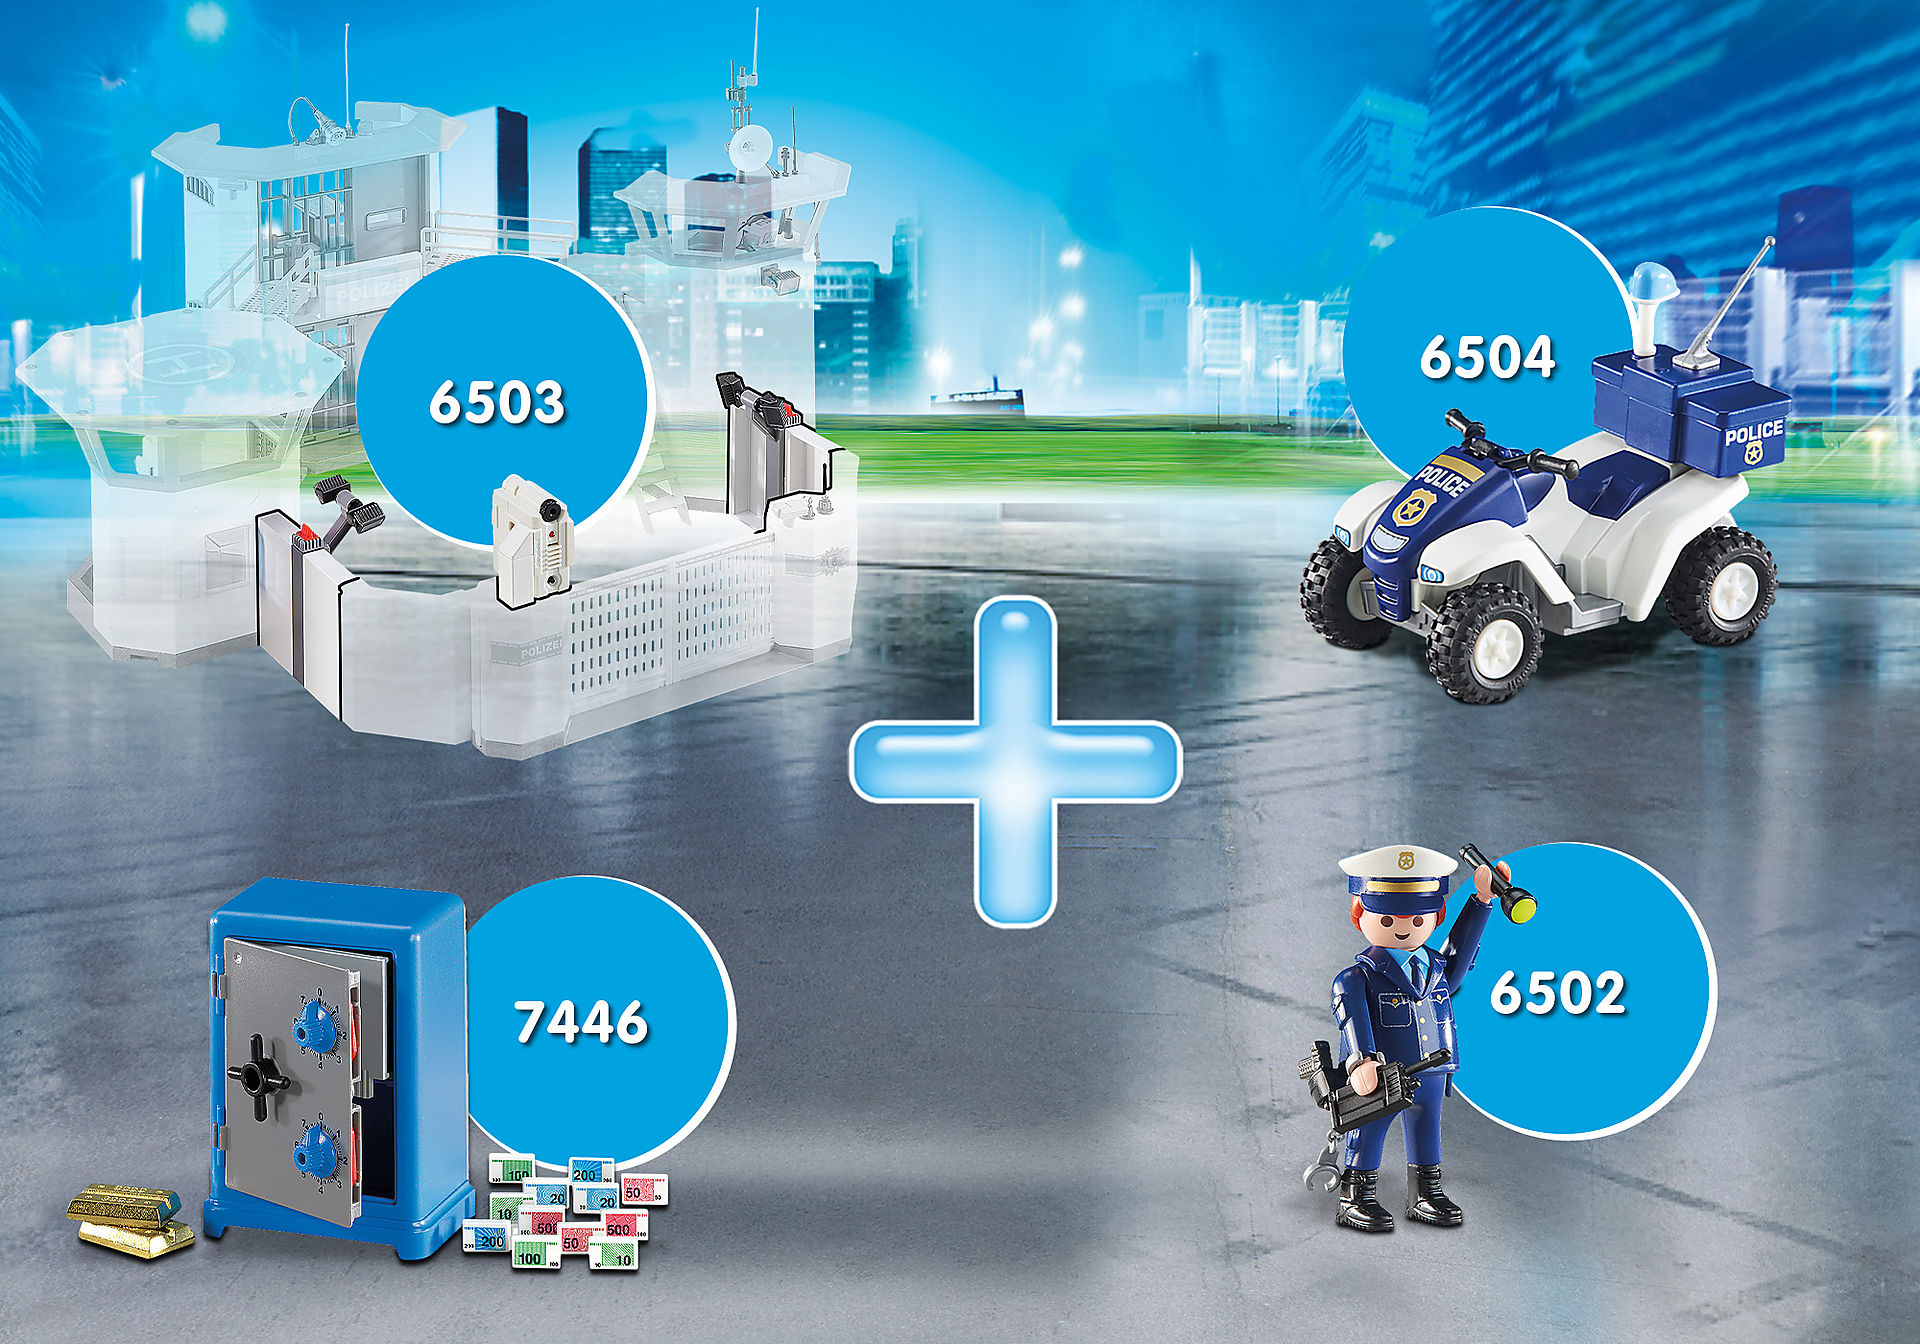 PM2012I Super Promo Pack Complementos Polícia zoom image1